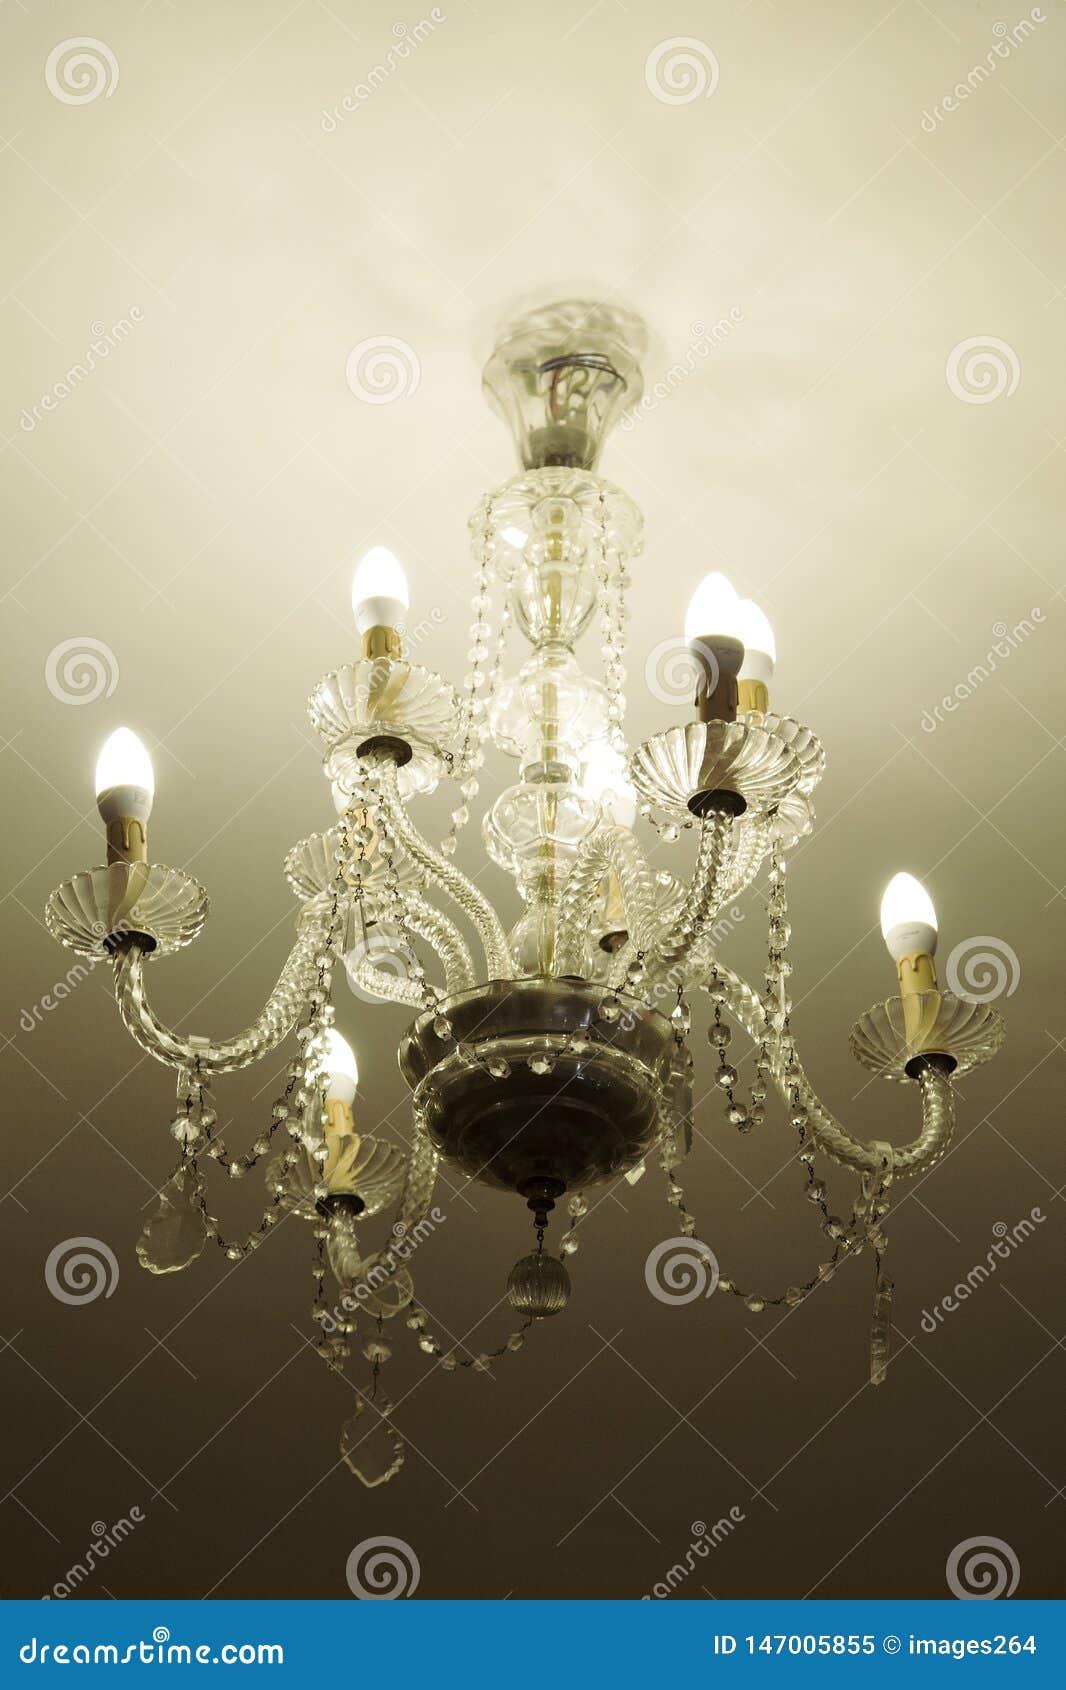 Leuchtleuchter